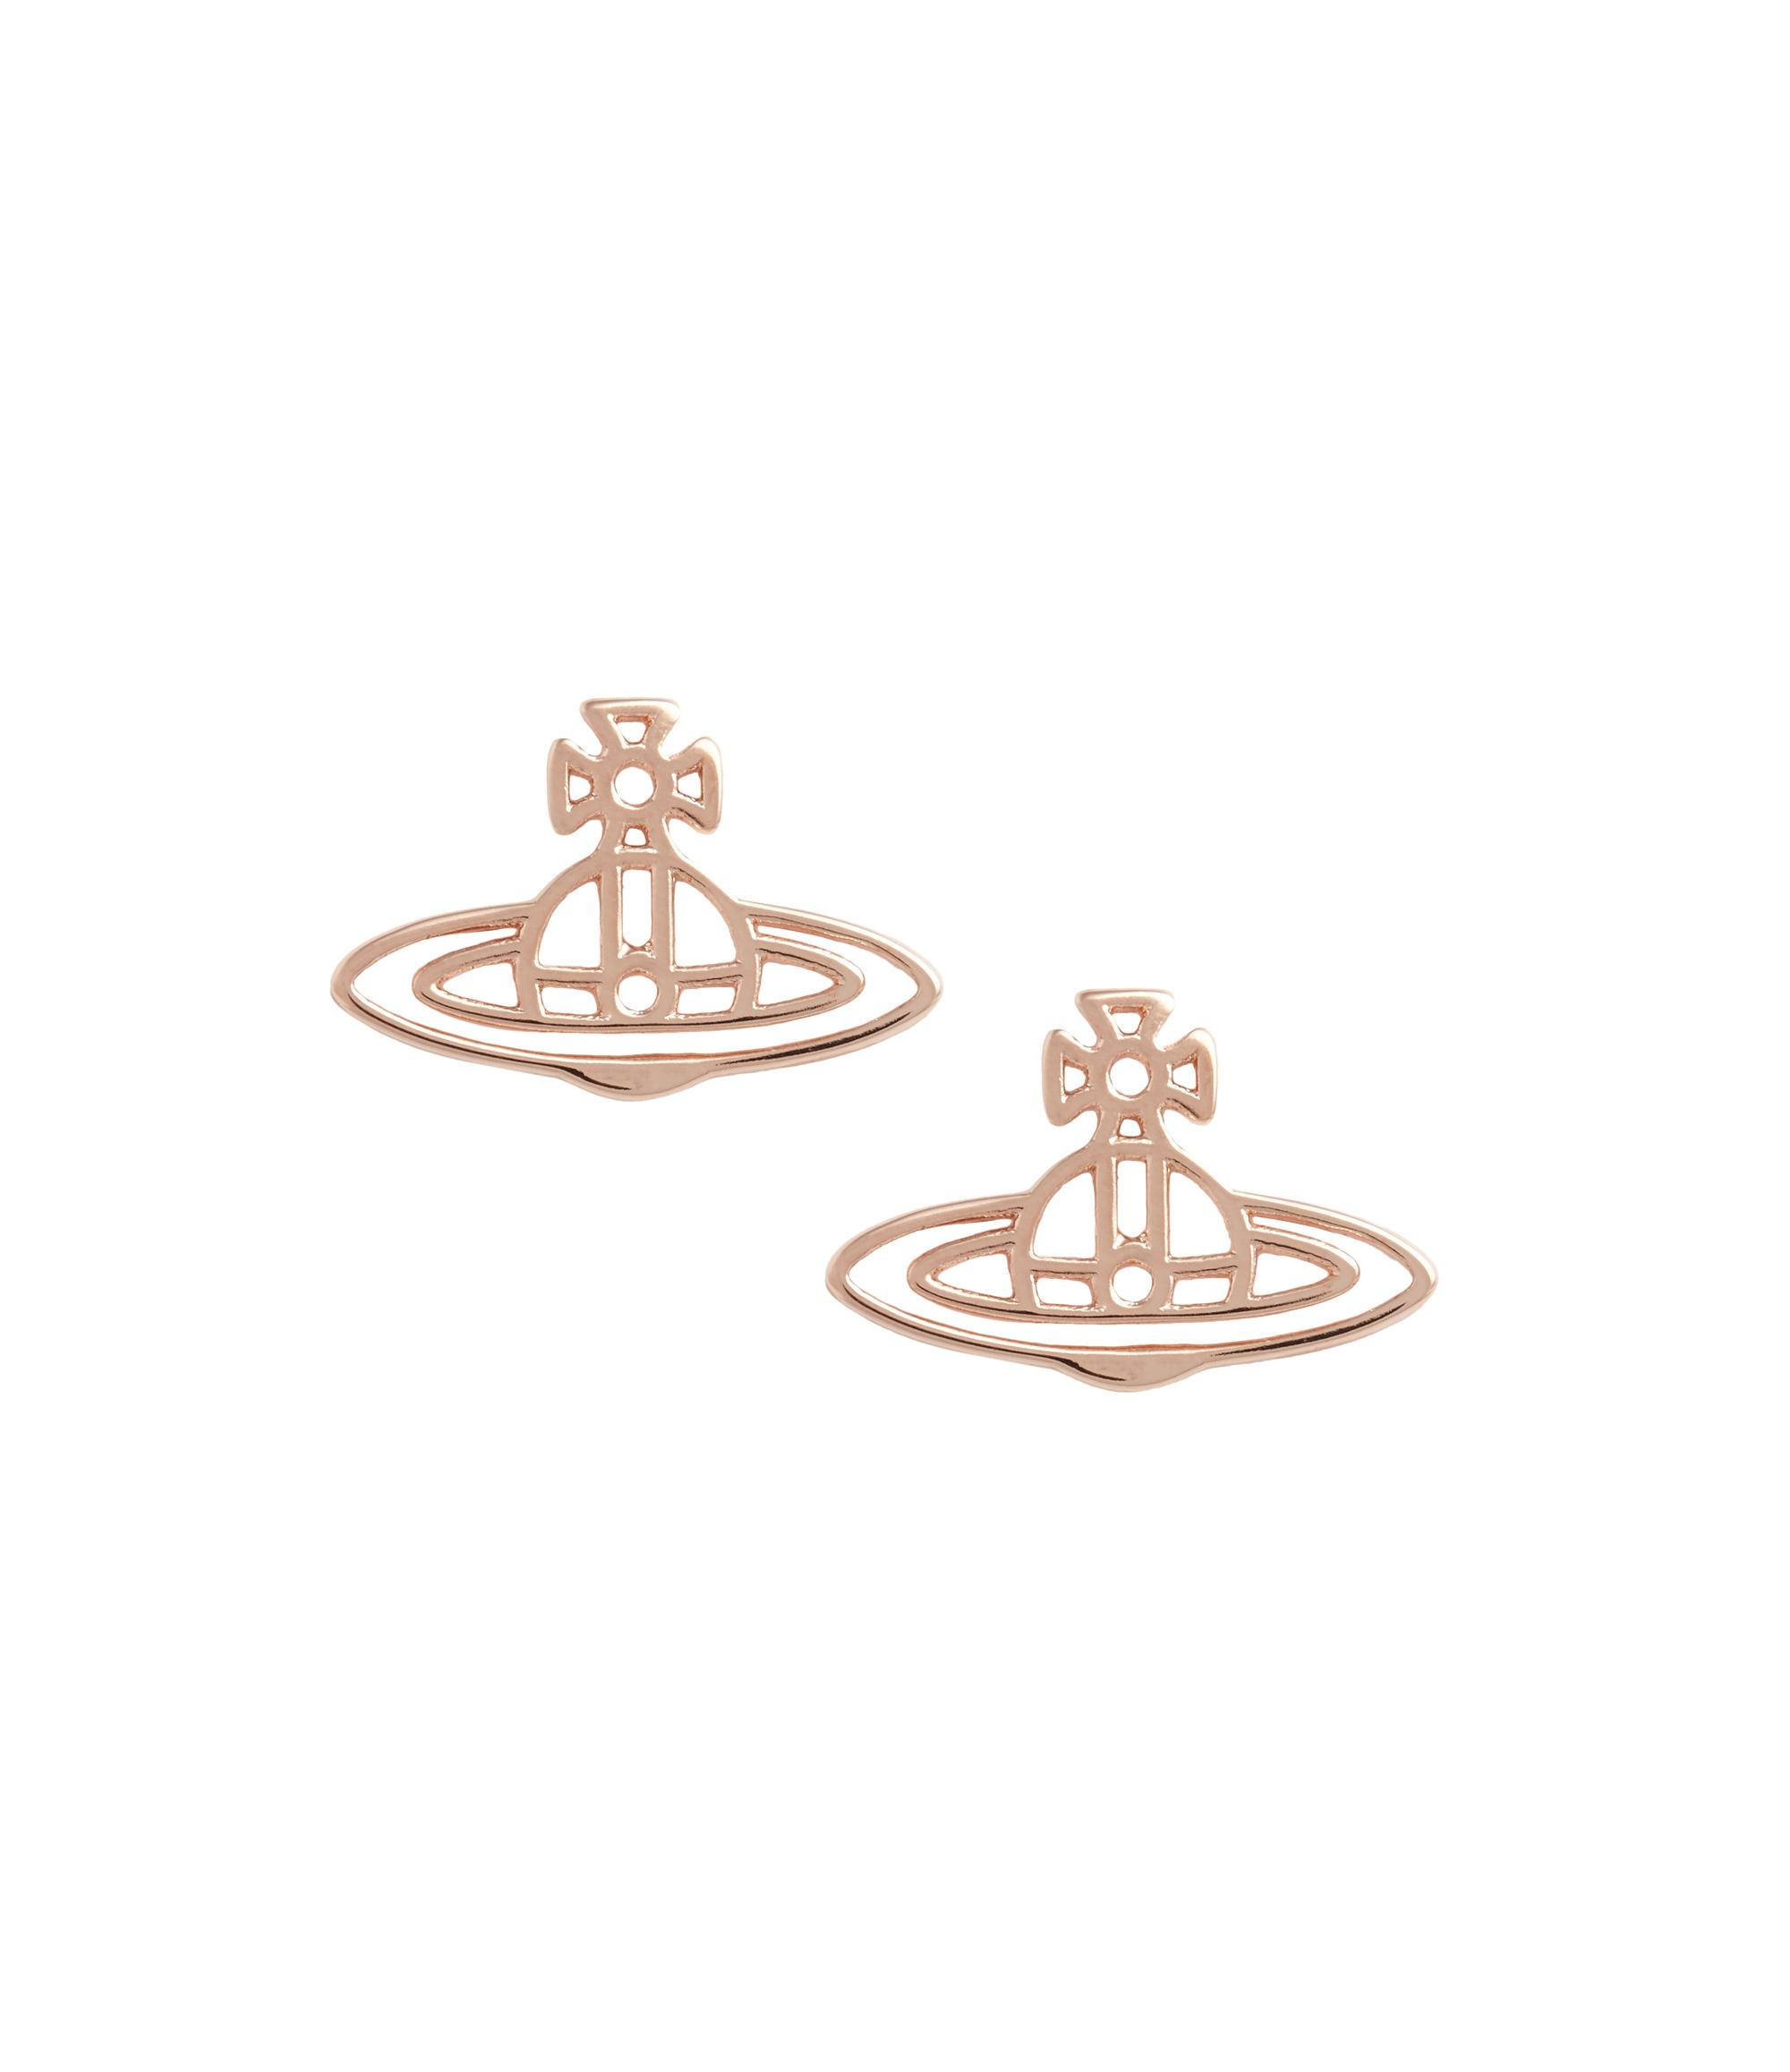 58b287b36 Vivienne Westwood Thin Lines Flat Orb Stud Earrings Pink Gold | ModeSens